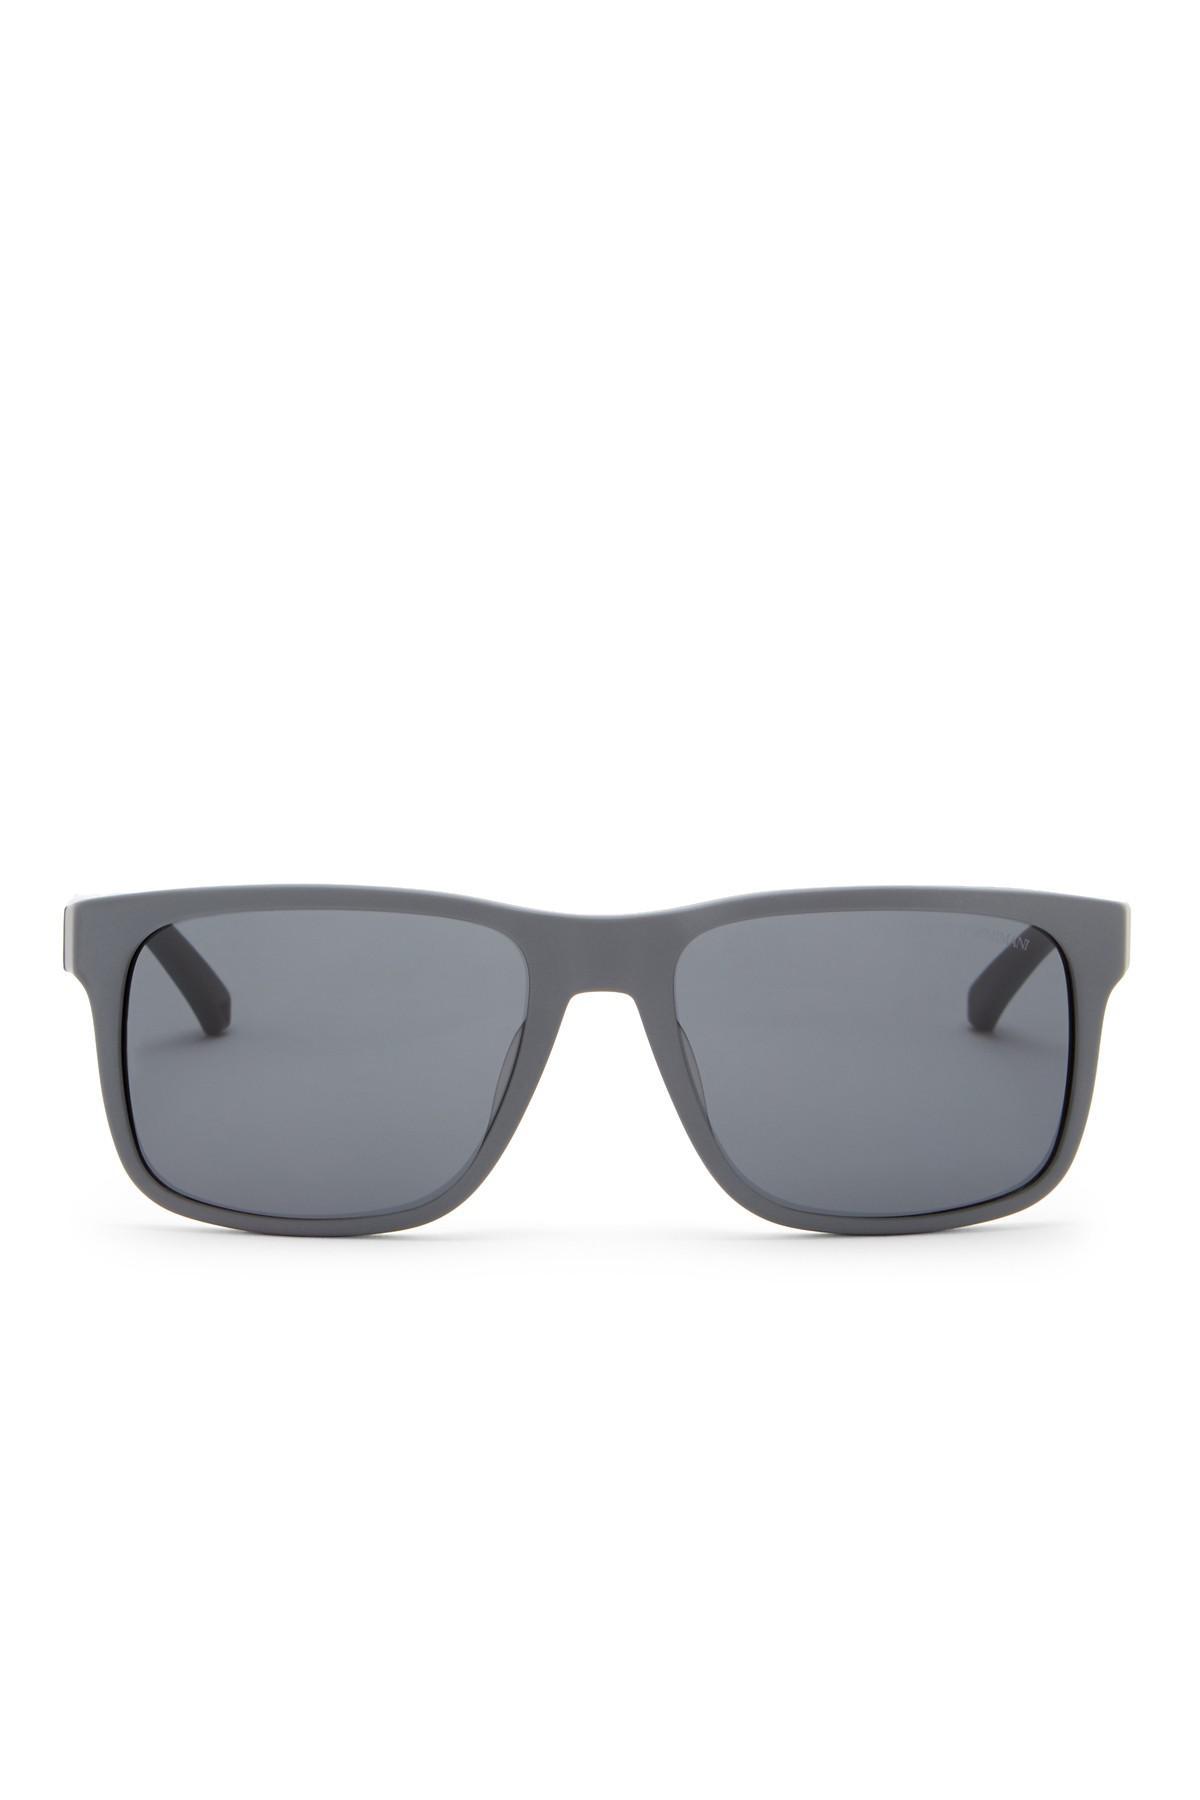 c8d833f21f08 Lyst - Emporio Armani 56mm Wayfarer Acetate Frame Sunglasses in Gray ...